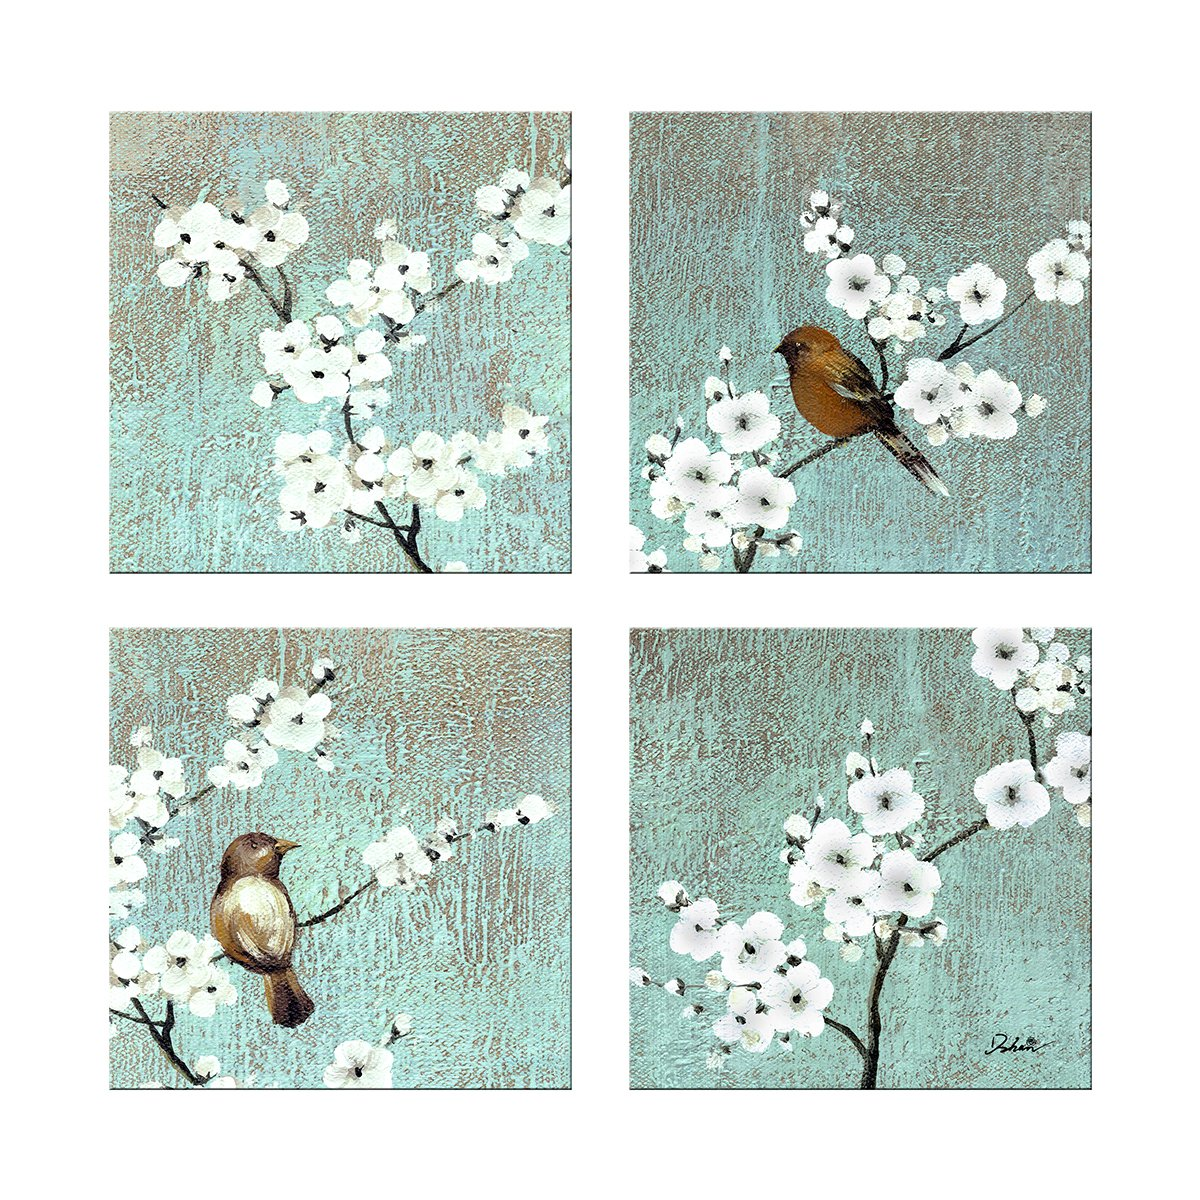 Dzhan Bird Wall Art, 13X13inches 4pc Botanical Prints Wall ...